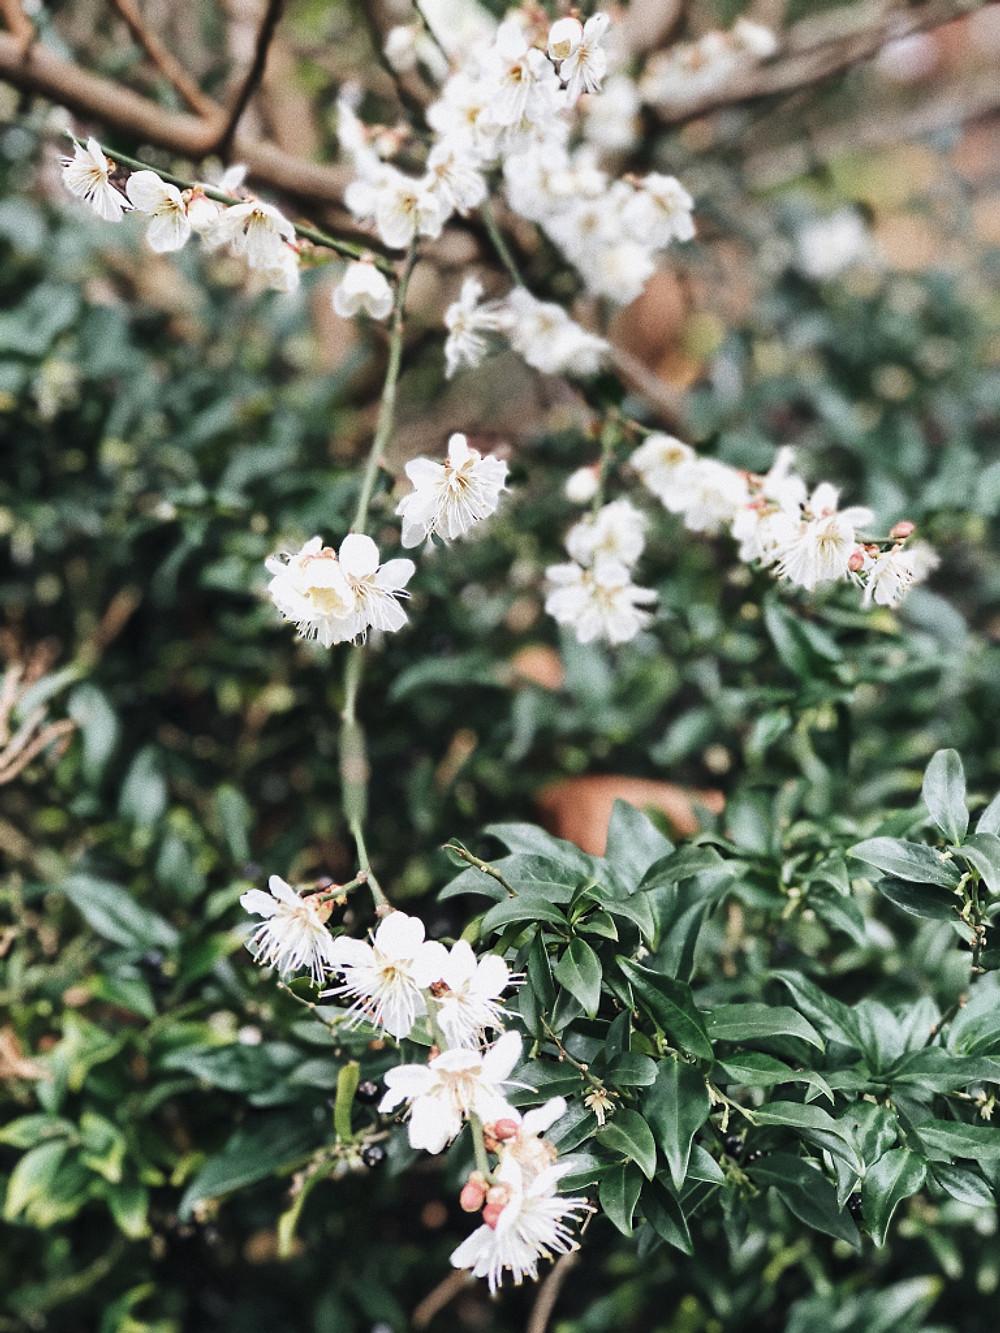 Chelsea Physic Garden, oldest botanical garden in London - Too Many Plants Blog